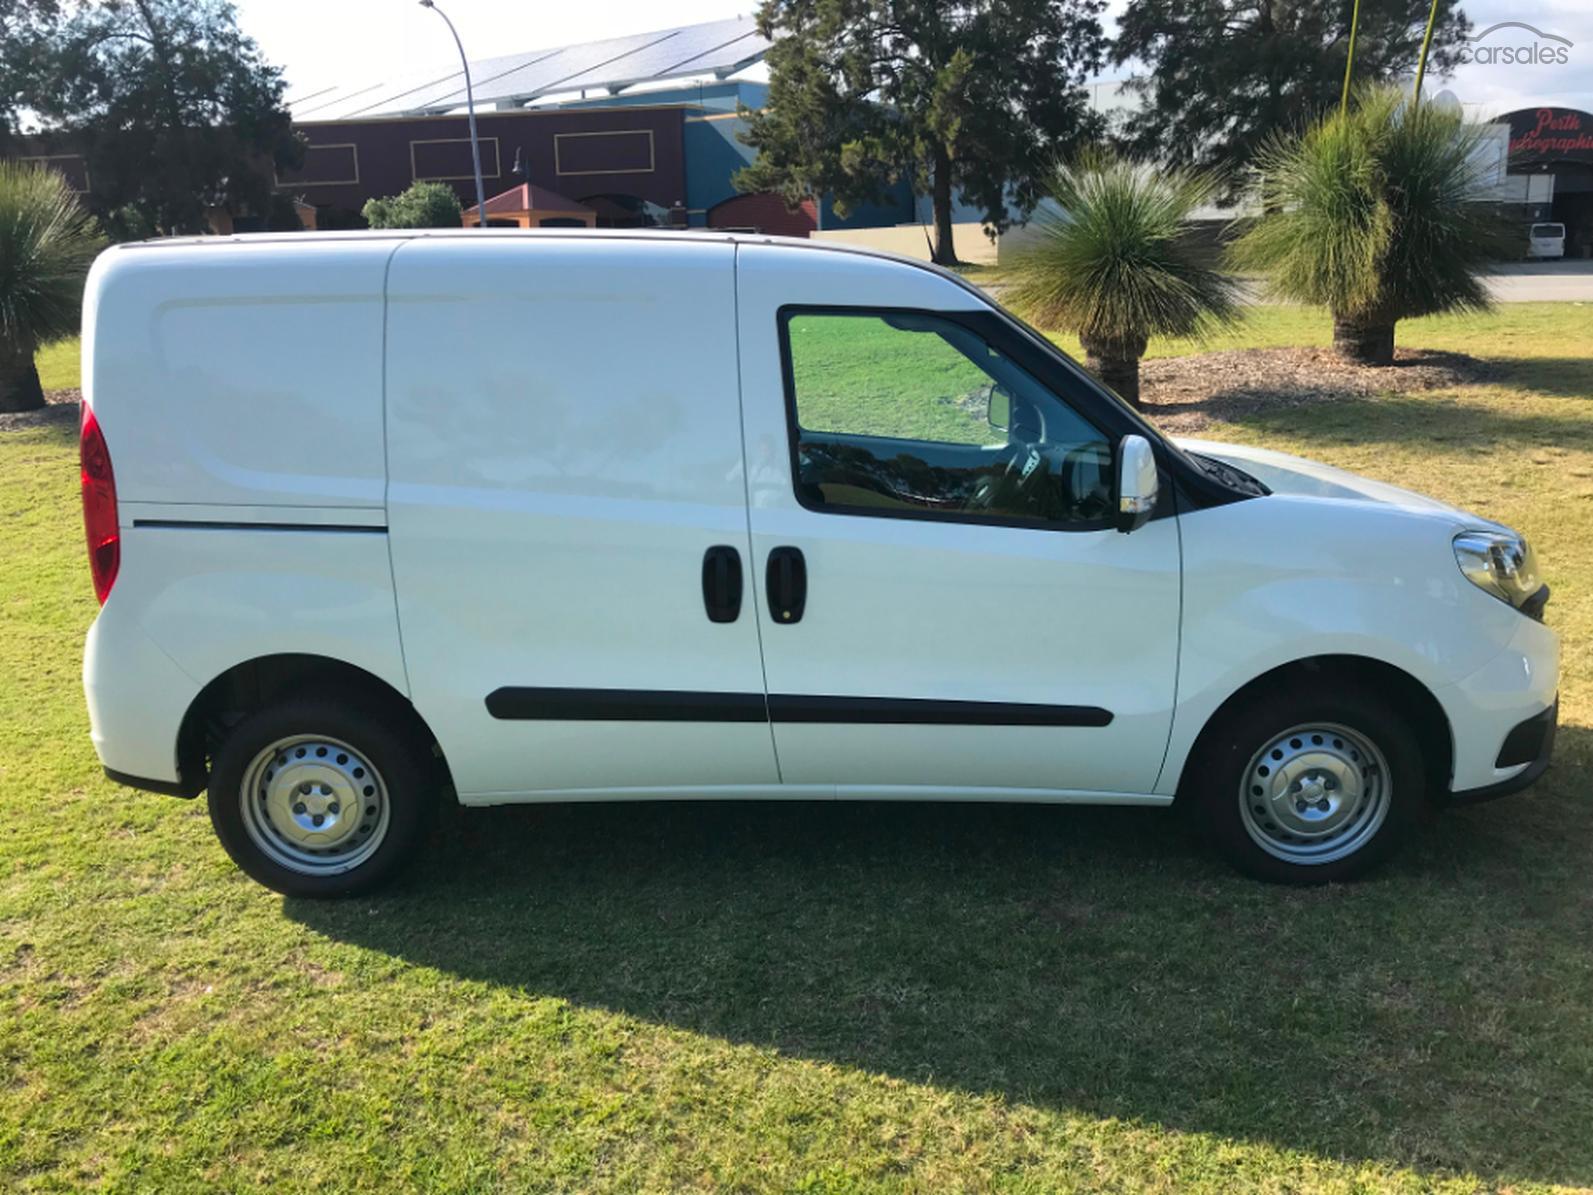 8077ccaa5f 2018 Fiat Doblo SWB Auto-OAG-AD-16447000 - carsales.com.au